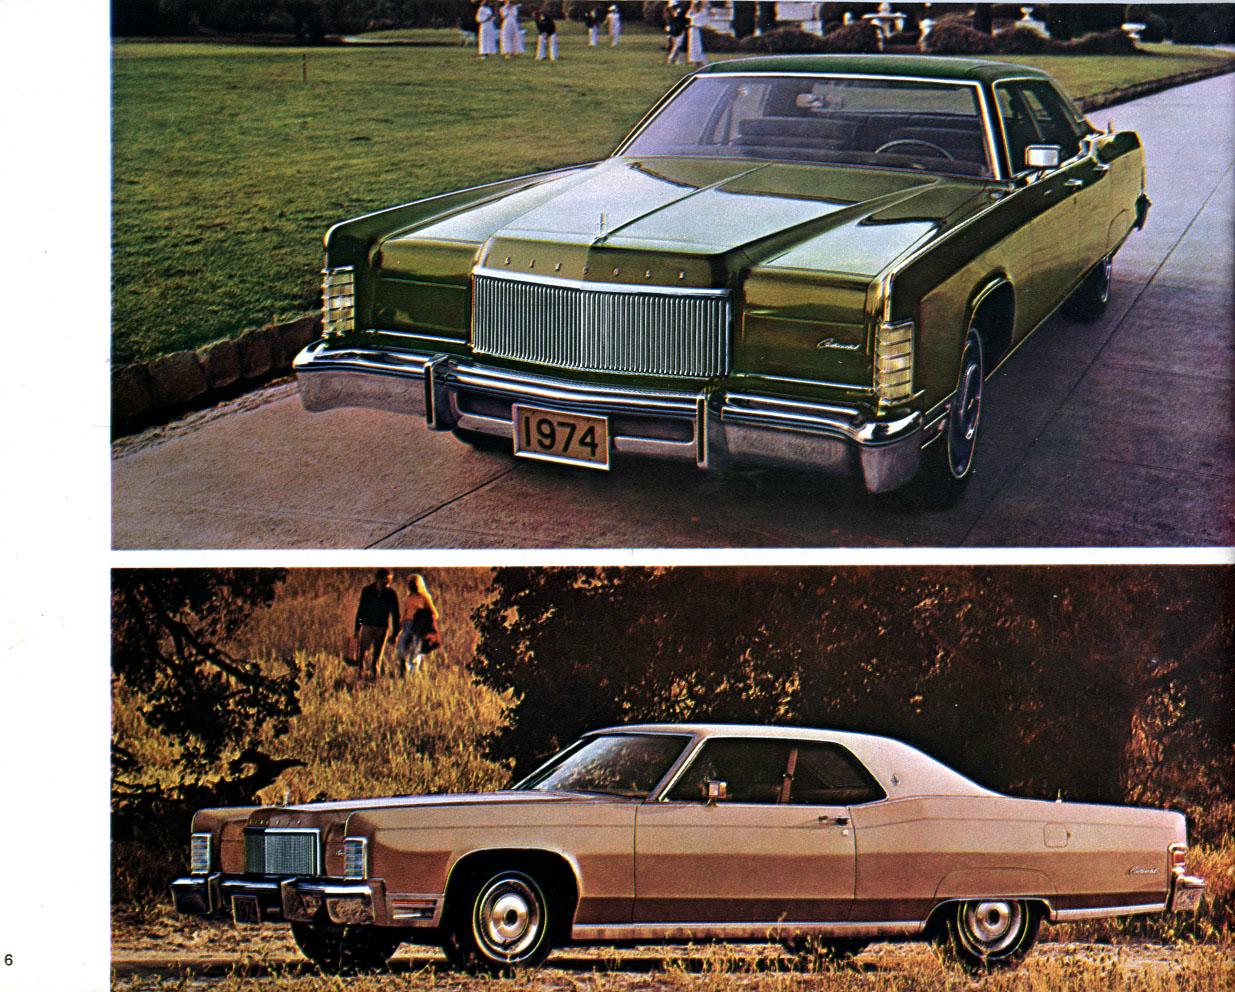 Lincoln Mercury Englisch Prospekt Brochure Capri 1 Progr.1974  26,5x21cm 32S